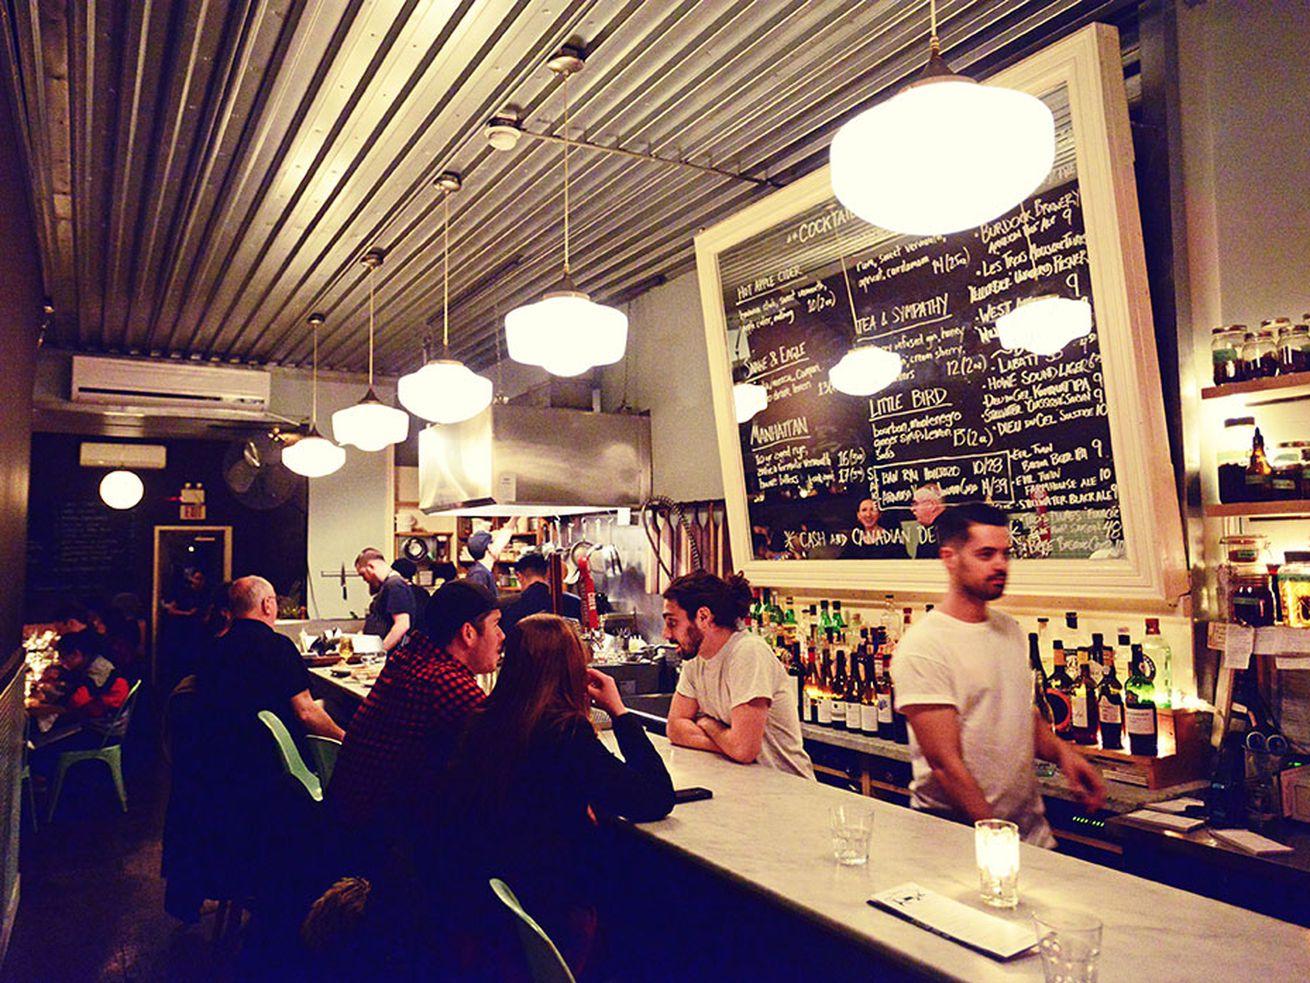 Groundbreaking Toronto Restaurant the Black Hoof Will Close This Summer